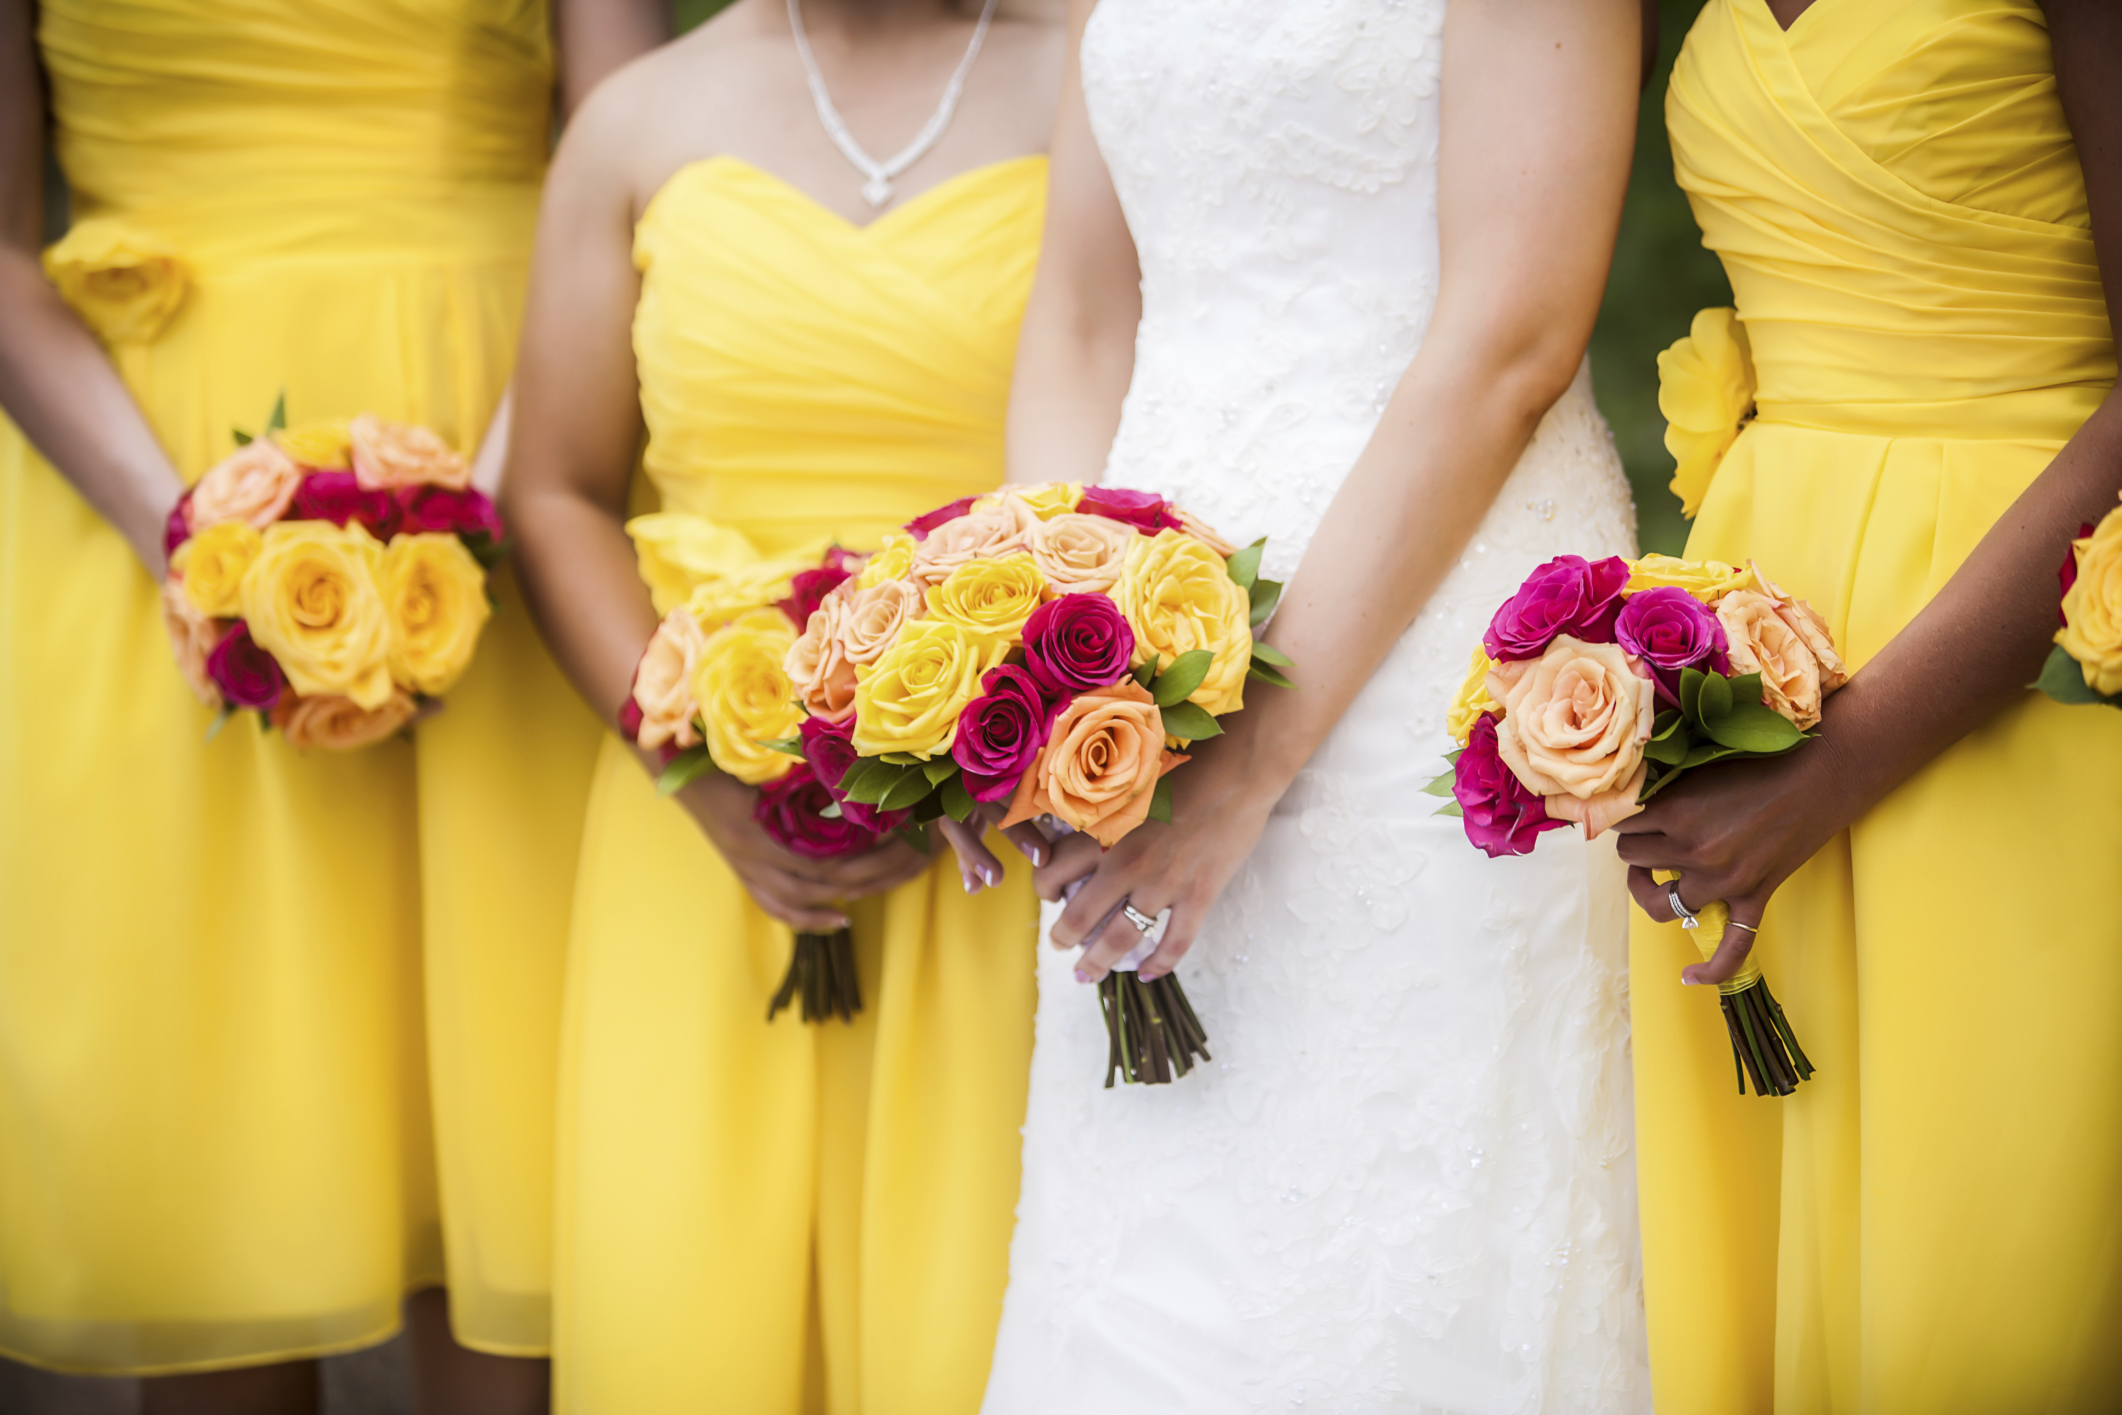 Wedding Colour Themes Articles Easy Weddings